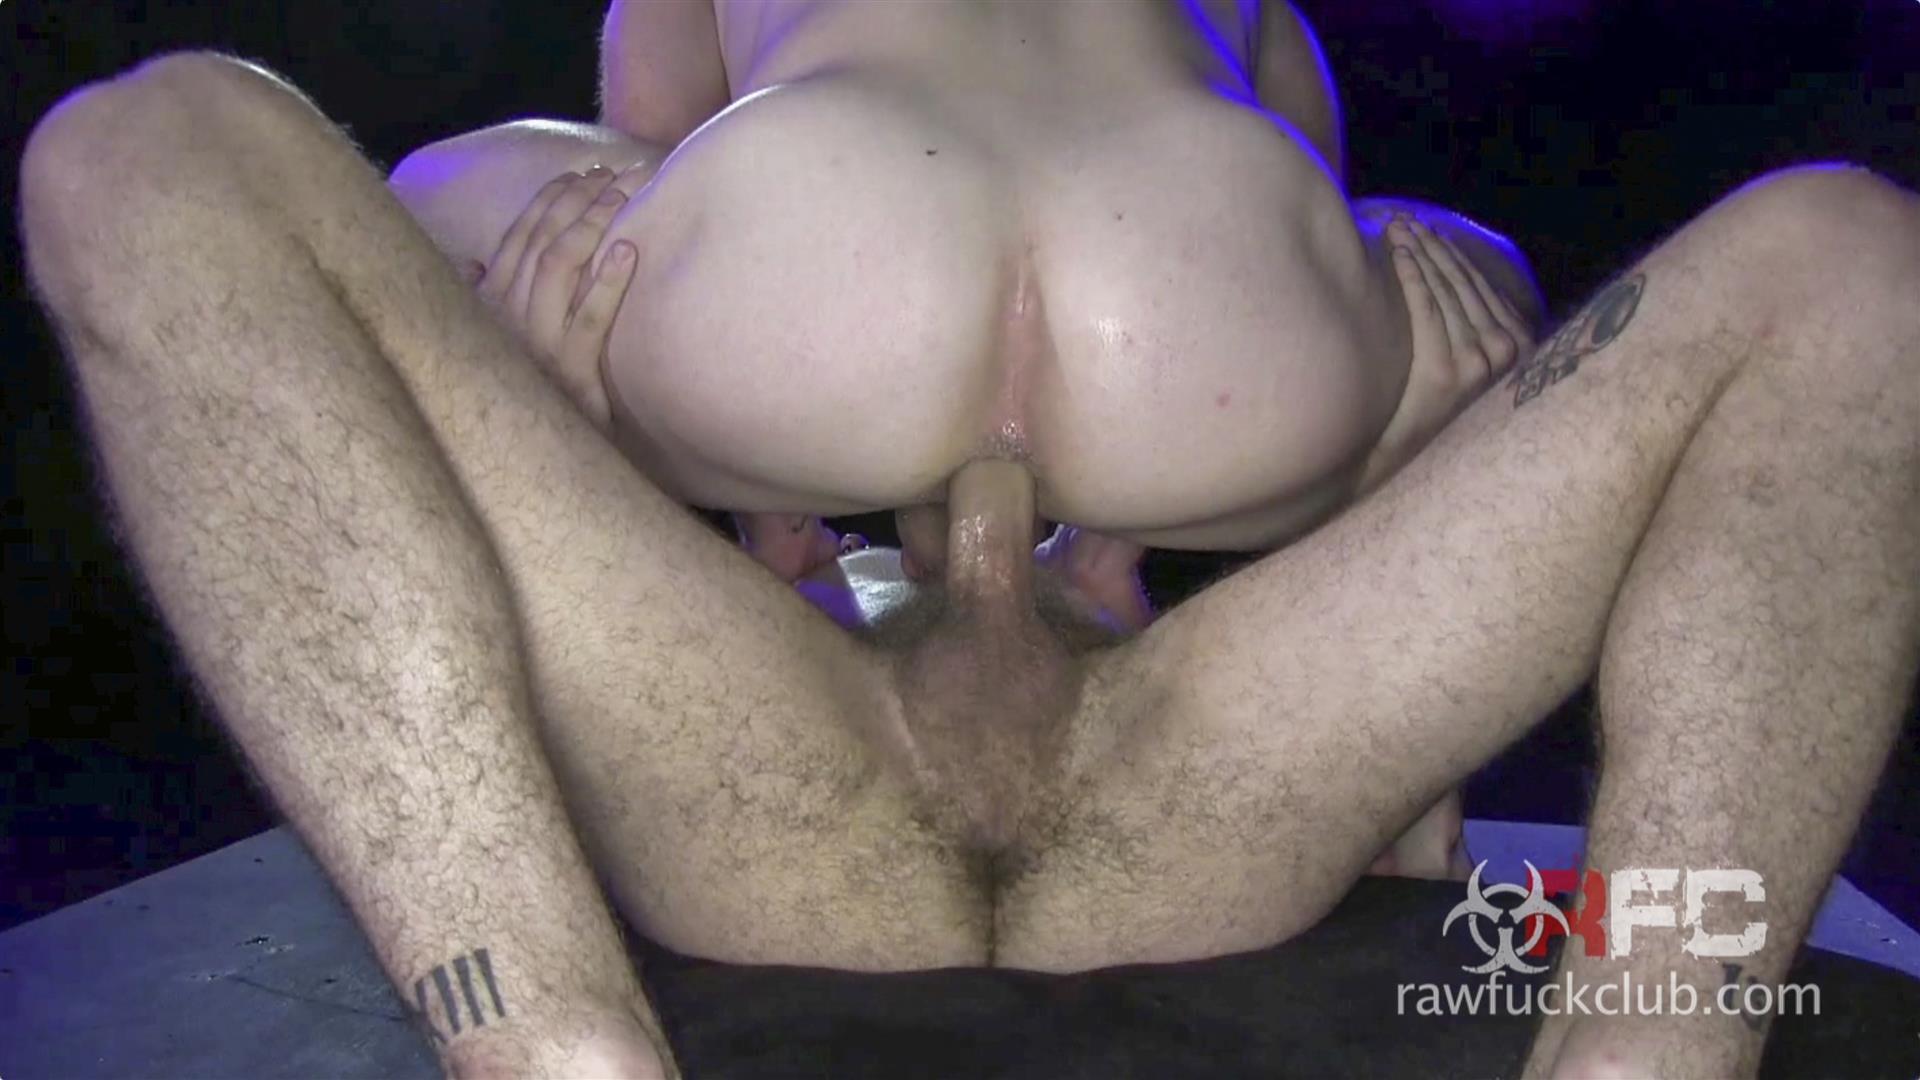 Raw-Fuck-Club-Saxon-West-and-Luke-Harding-Big-Dick-Bareback-Sex-Amateur-Gay-Porn-4 Luke Harding Breeding Saxon West's Muscular Ass